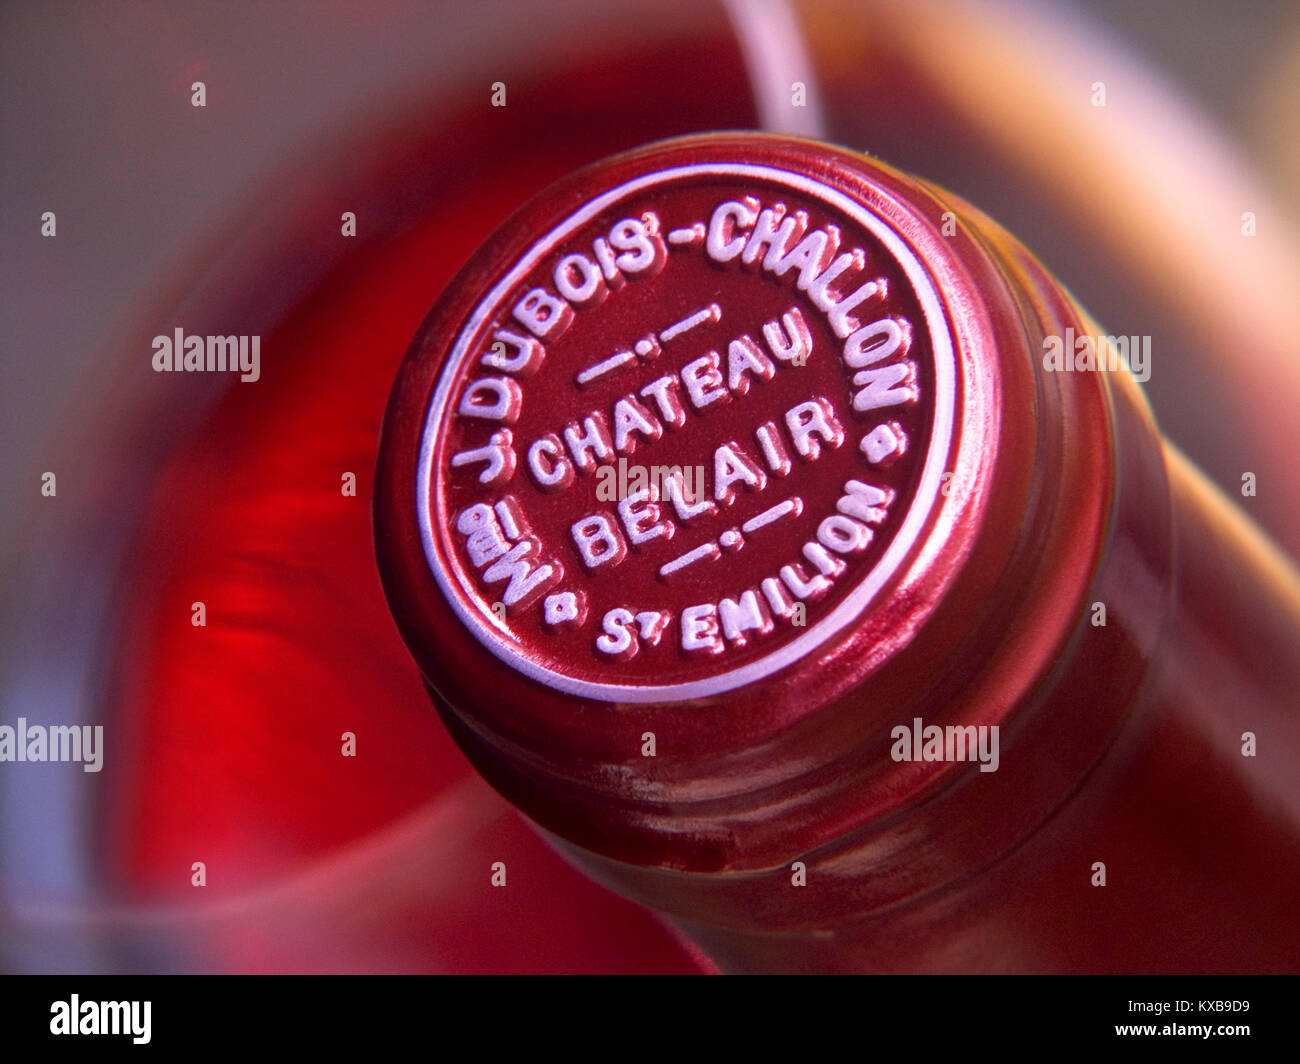 VINTAGE AGED CHATEAU BELAIR DETAIL BOTTLE TOP close up embossed encapsulation wine bottle top name Fine Bordeaux - Stock Image